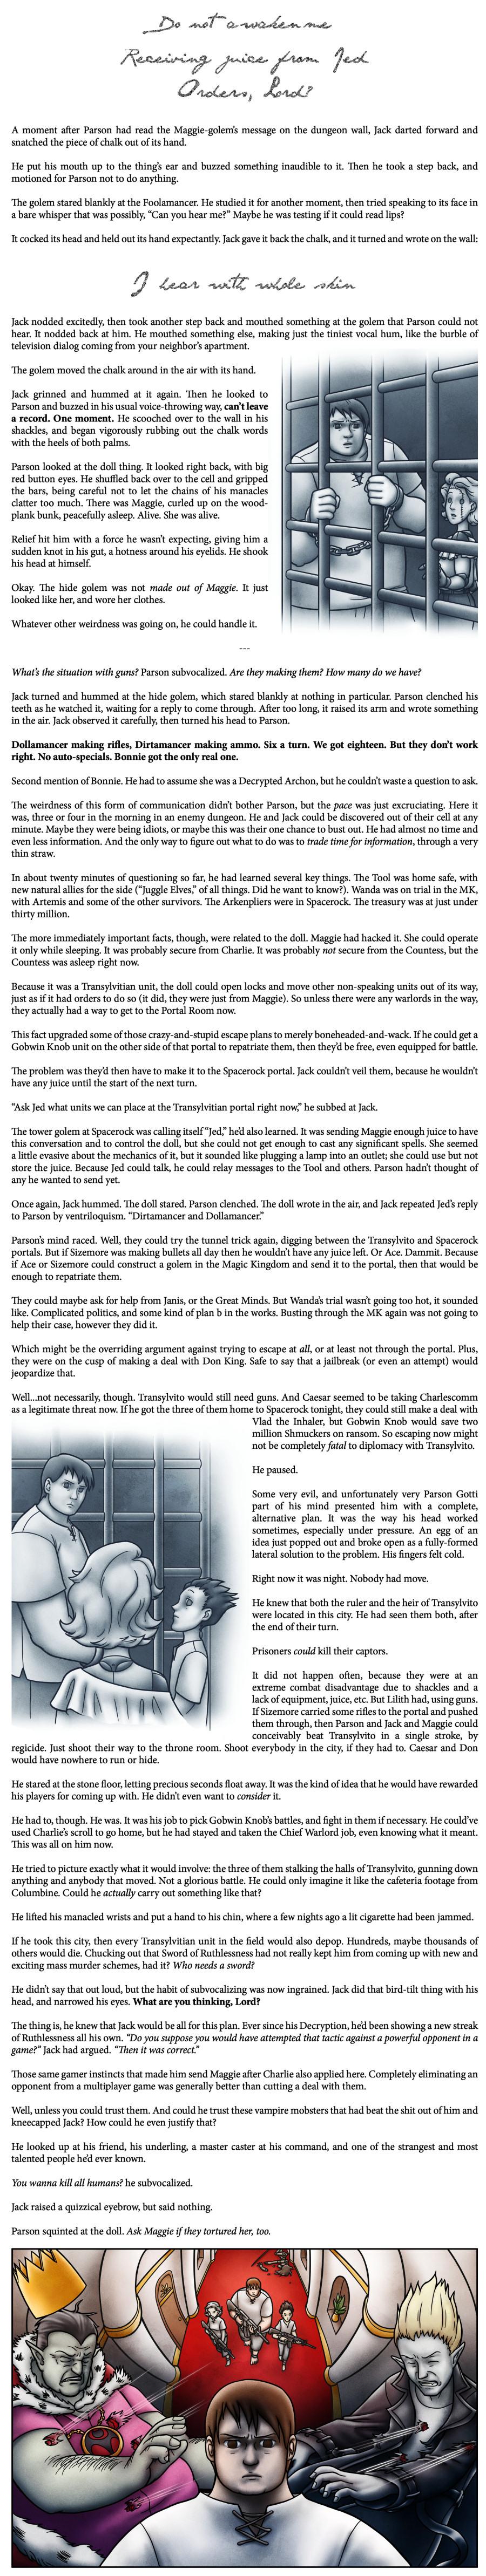 Comic - Book 4 - Page 37